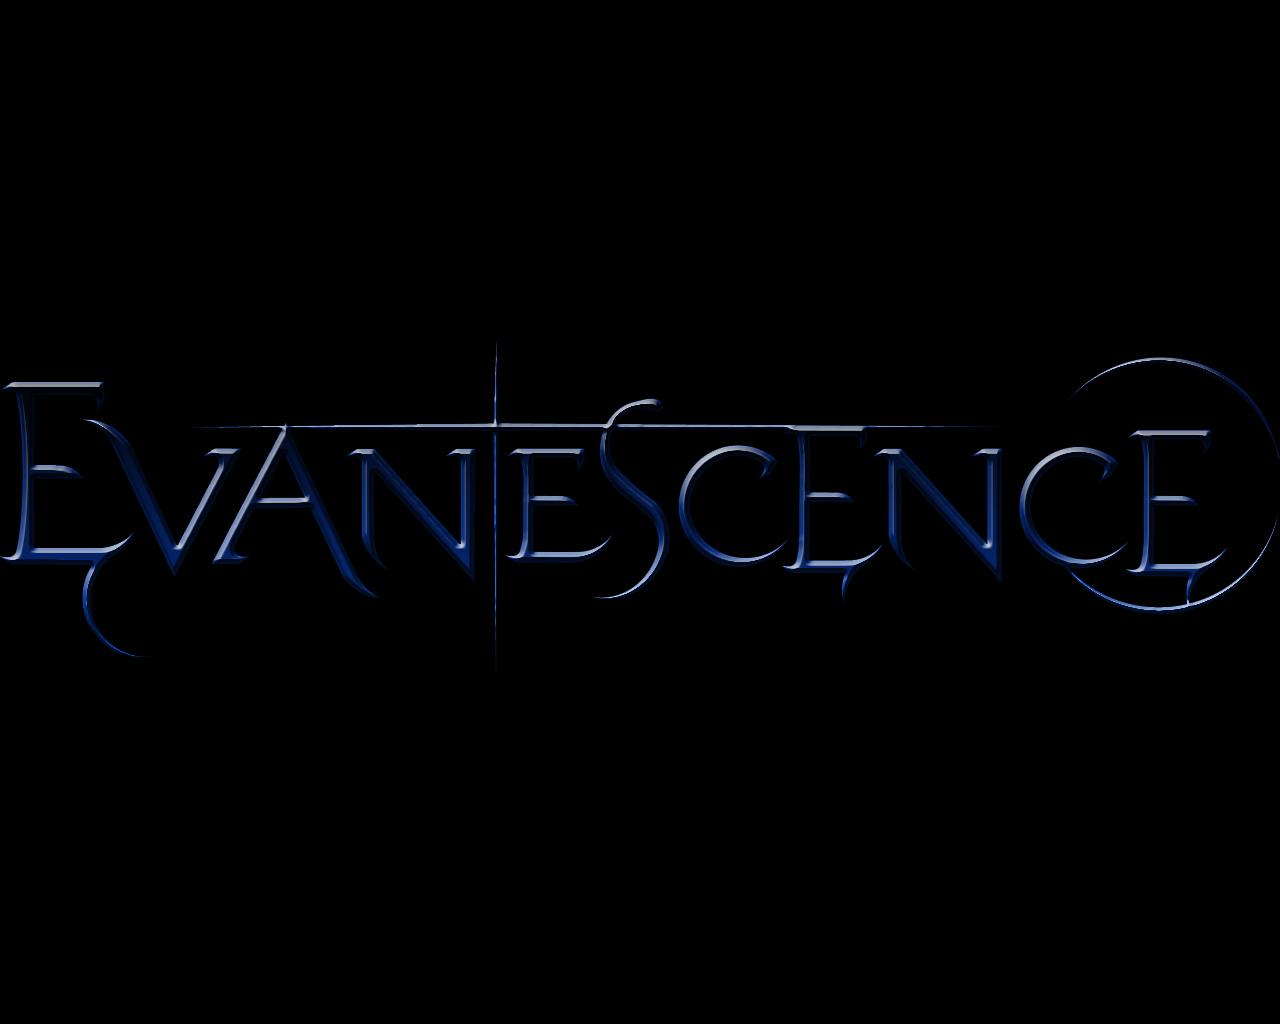 evanescence wallpaper by The Ataru Master 1280x1024